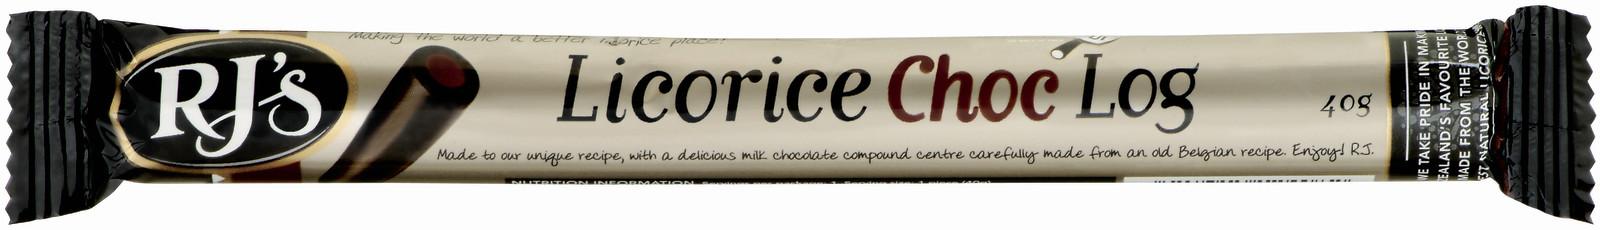 RJ's Licorice Choc Single Logs 40g (30 Pack) image